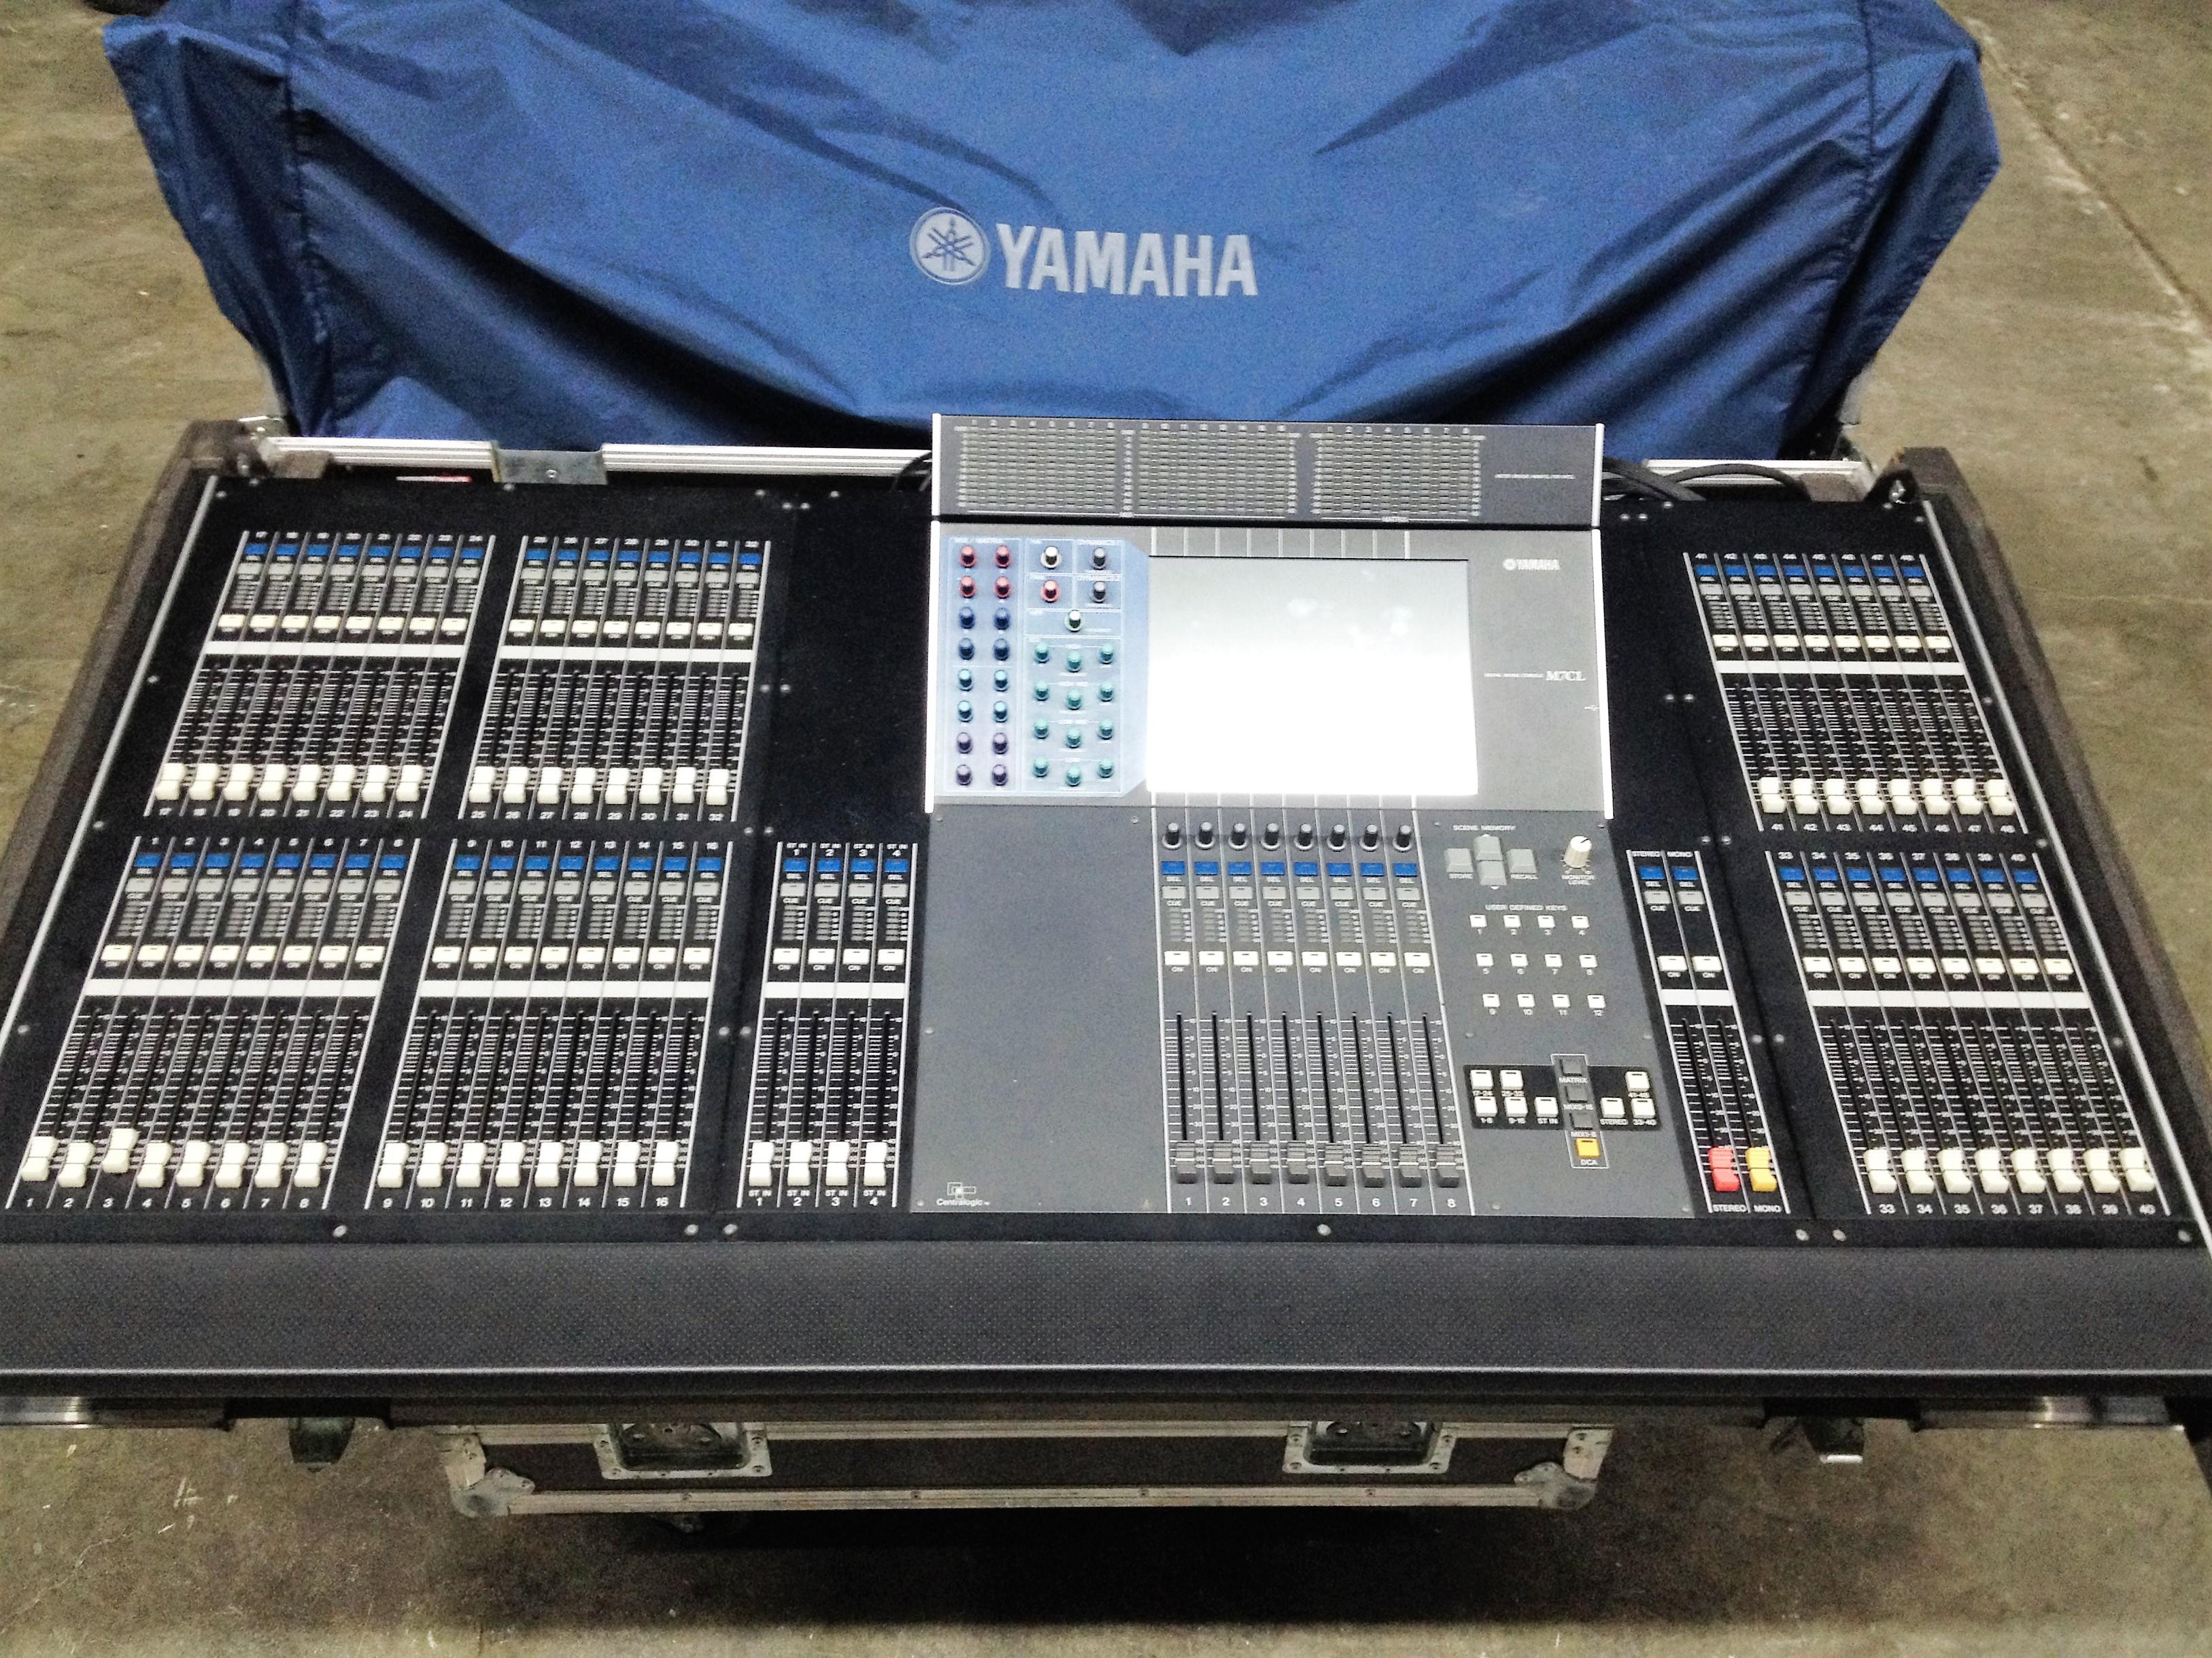 Yamaha m7cl 48 image 1789361 audiofanzine for Yamaha m7cl 48 price